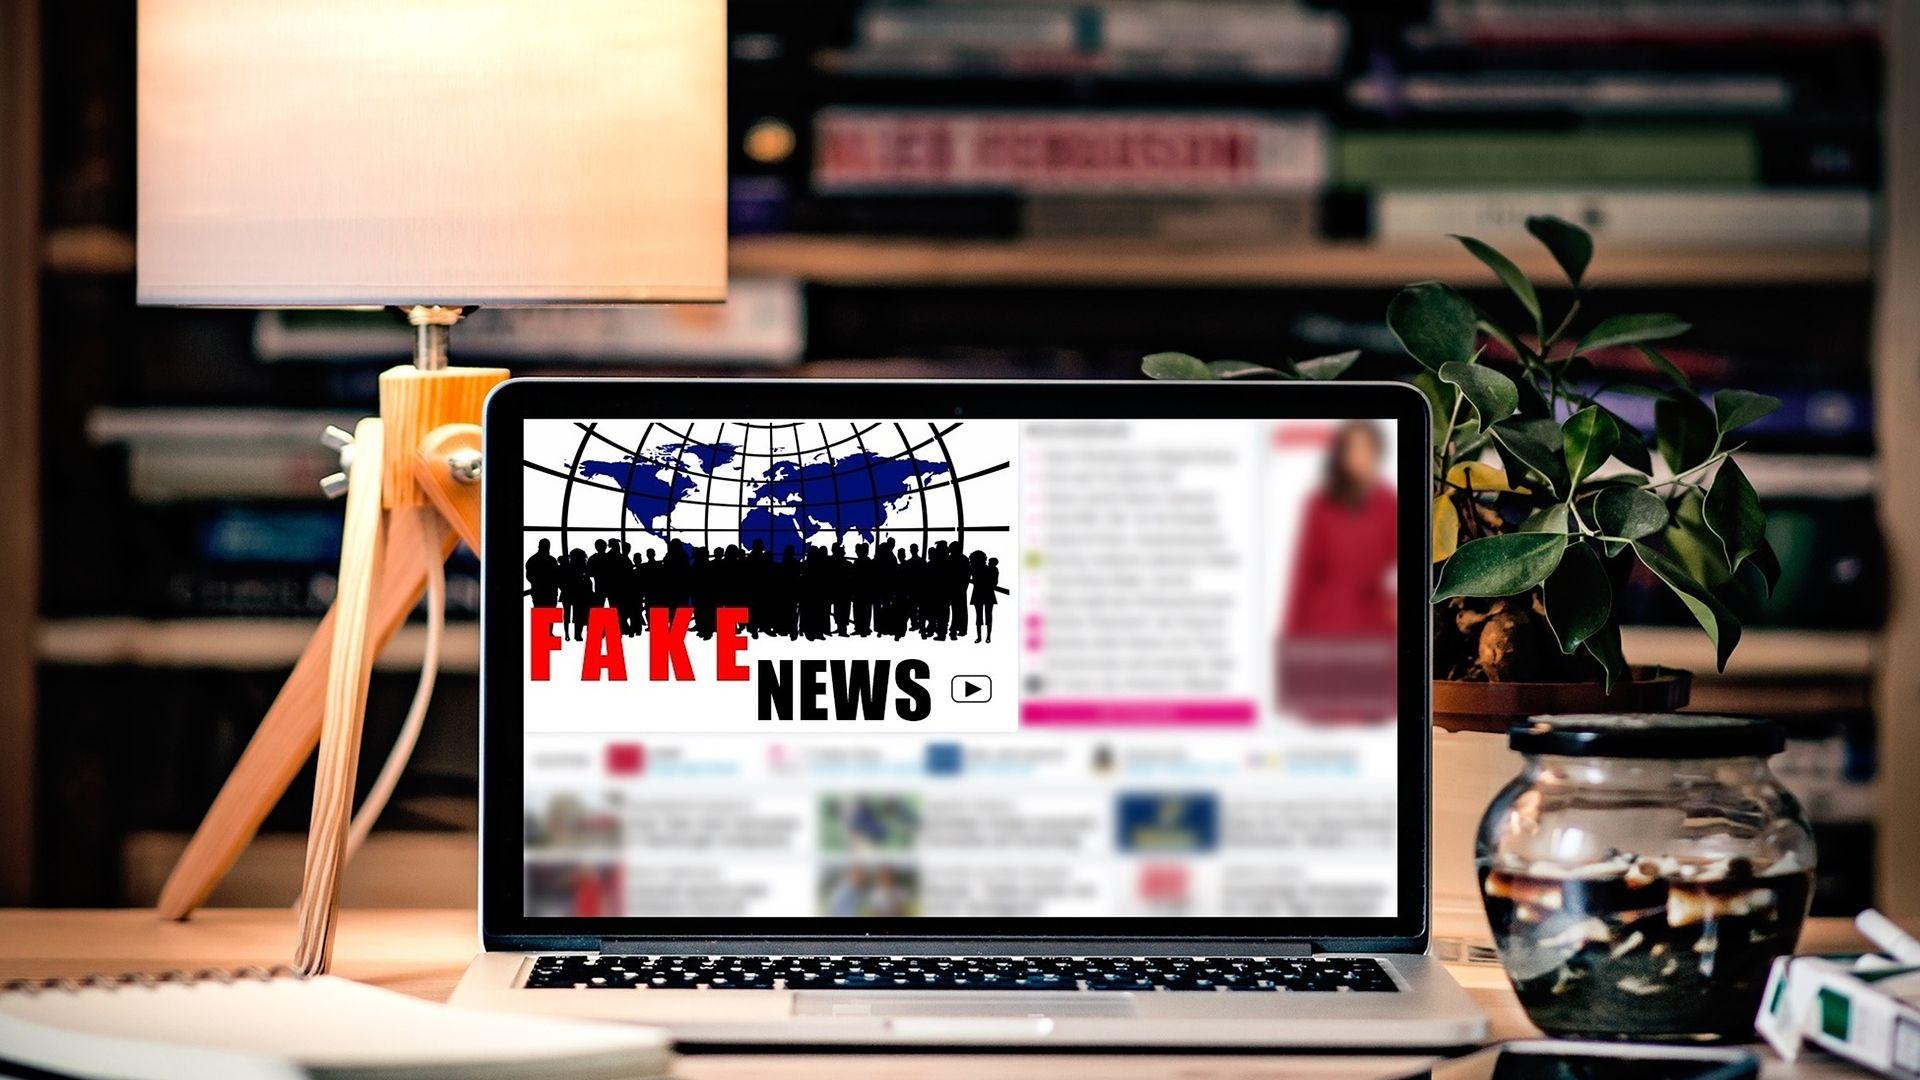 Български софтуер засича фалшиви новини и интернет тролове